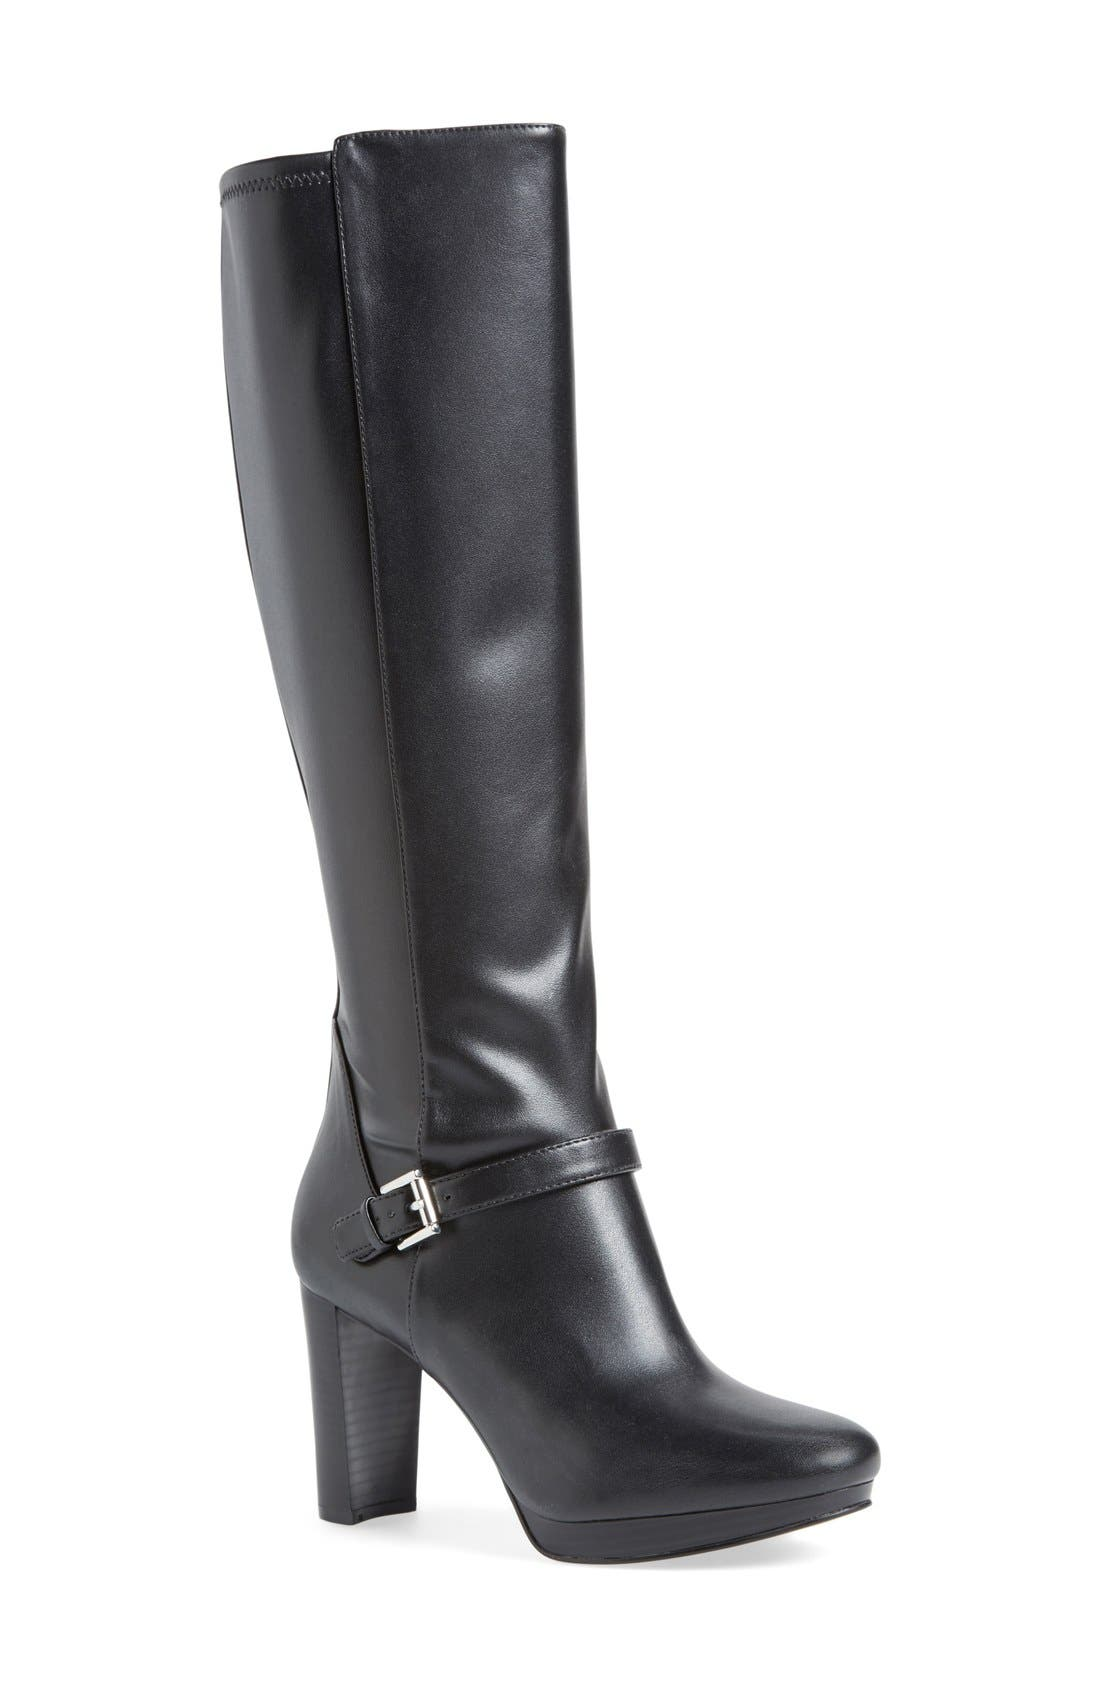 Alternate Image 1 Selected - Nine West 'Kacie' Tall Boot (Women)